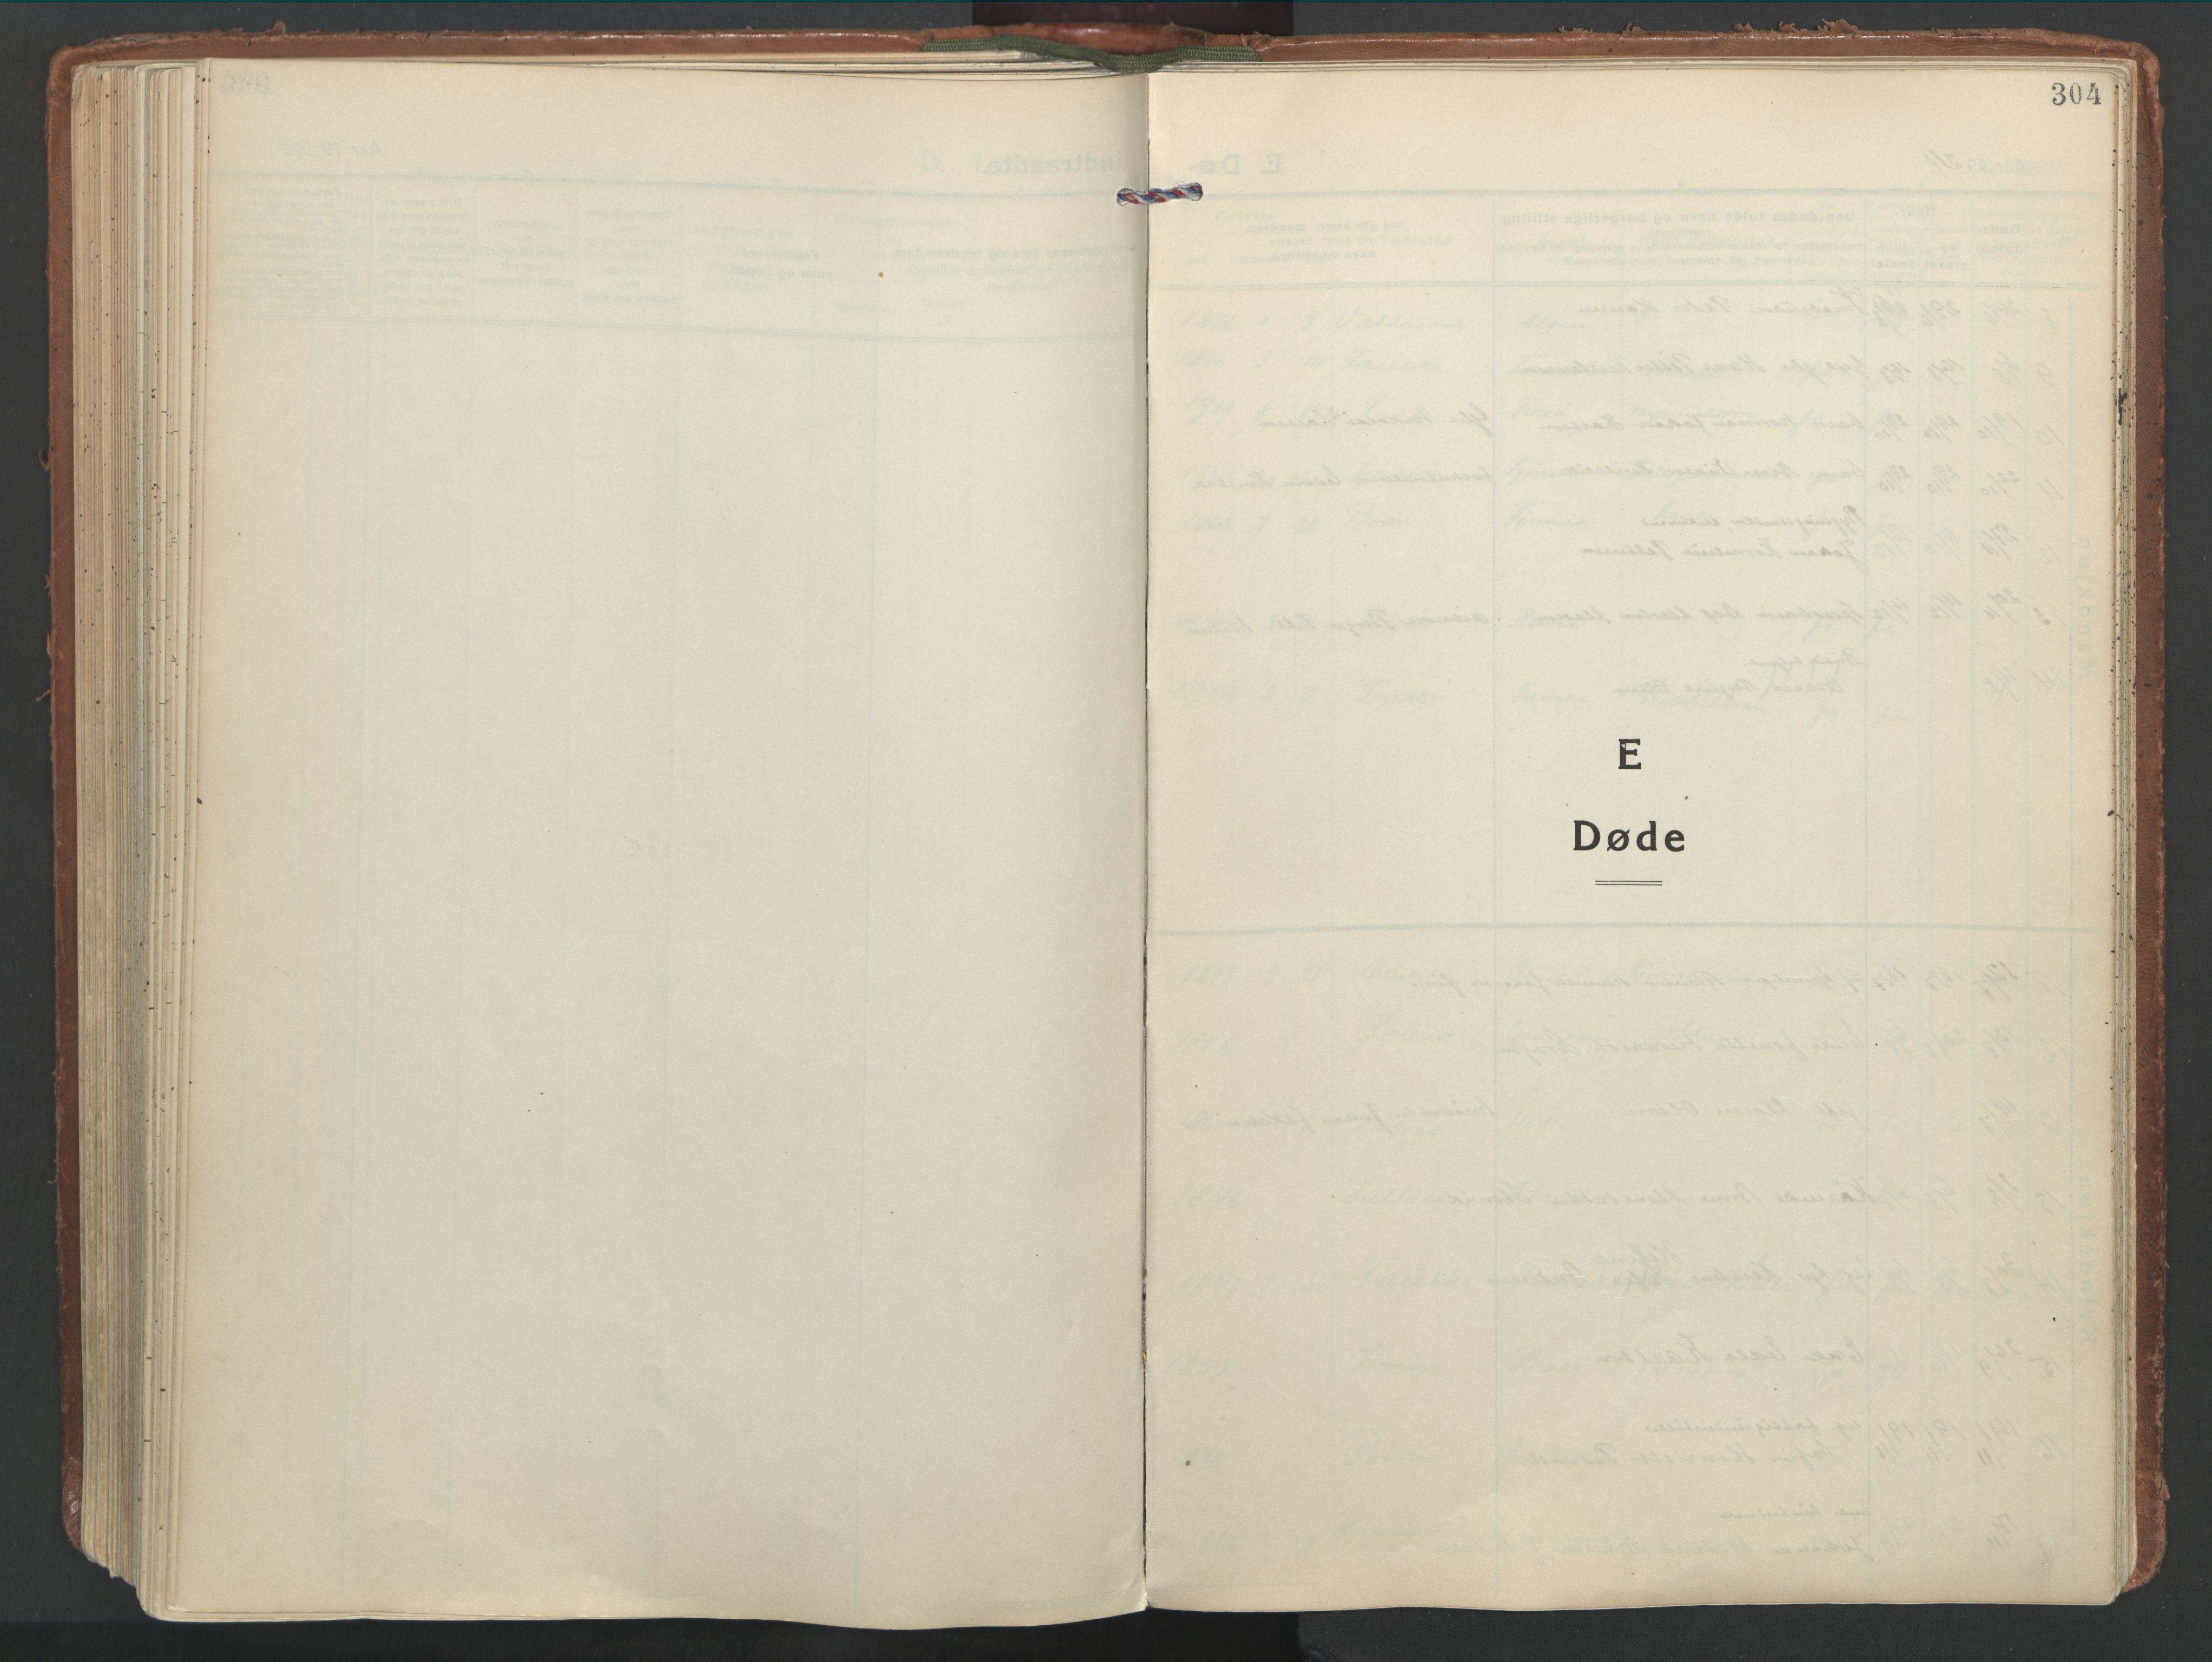 SAT, Ministerialprotokoller, klokkerbøker og fødselsregistre - Nordland, 849/L0699: Ministerialbok nr. 849A10, 1924-1937, s. 304